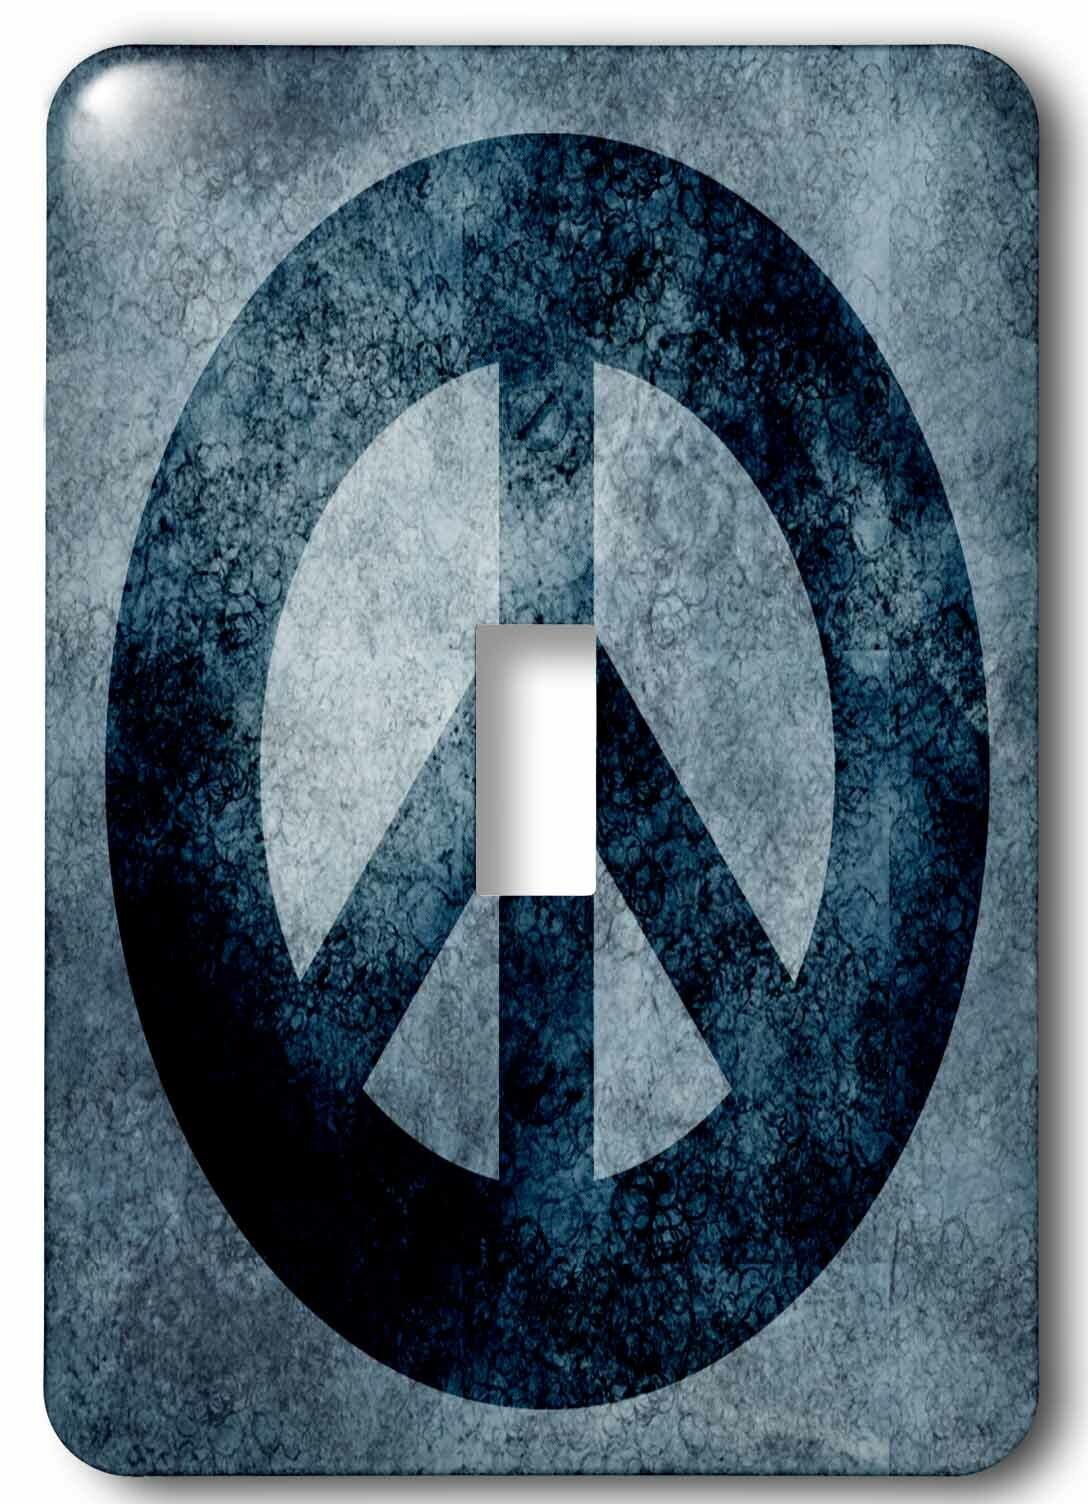 3drose Grunge Peace Sign 1 Gang Toggle Light Switch Wall Plate Wayfair